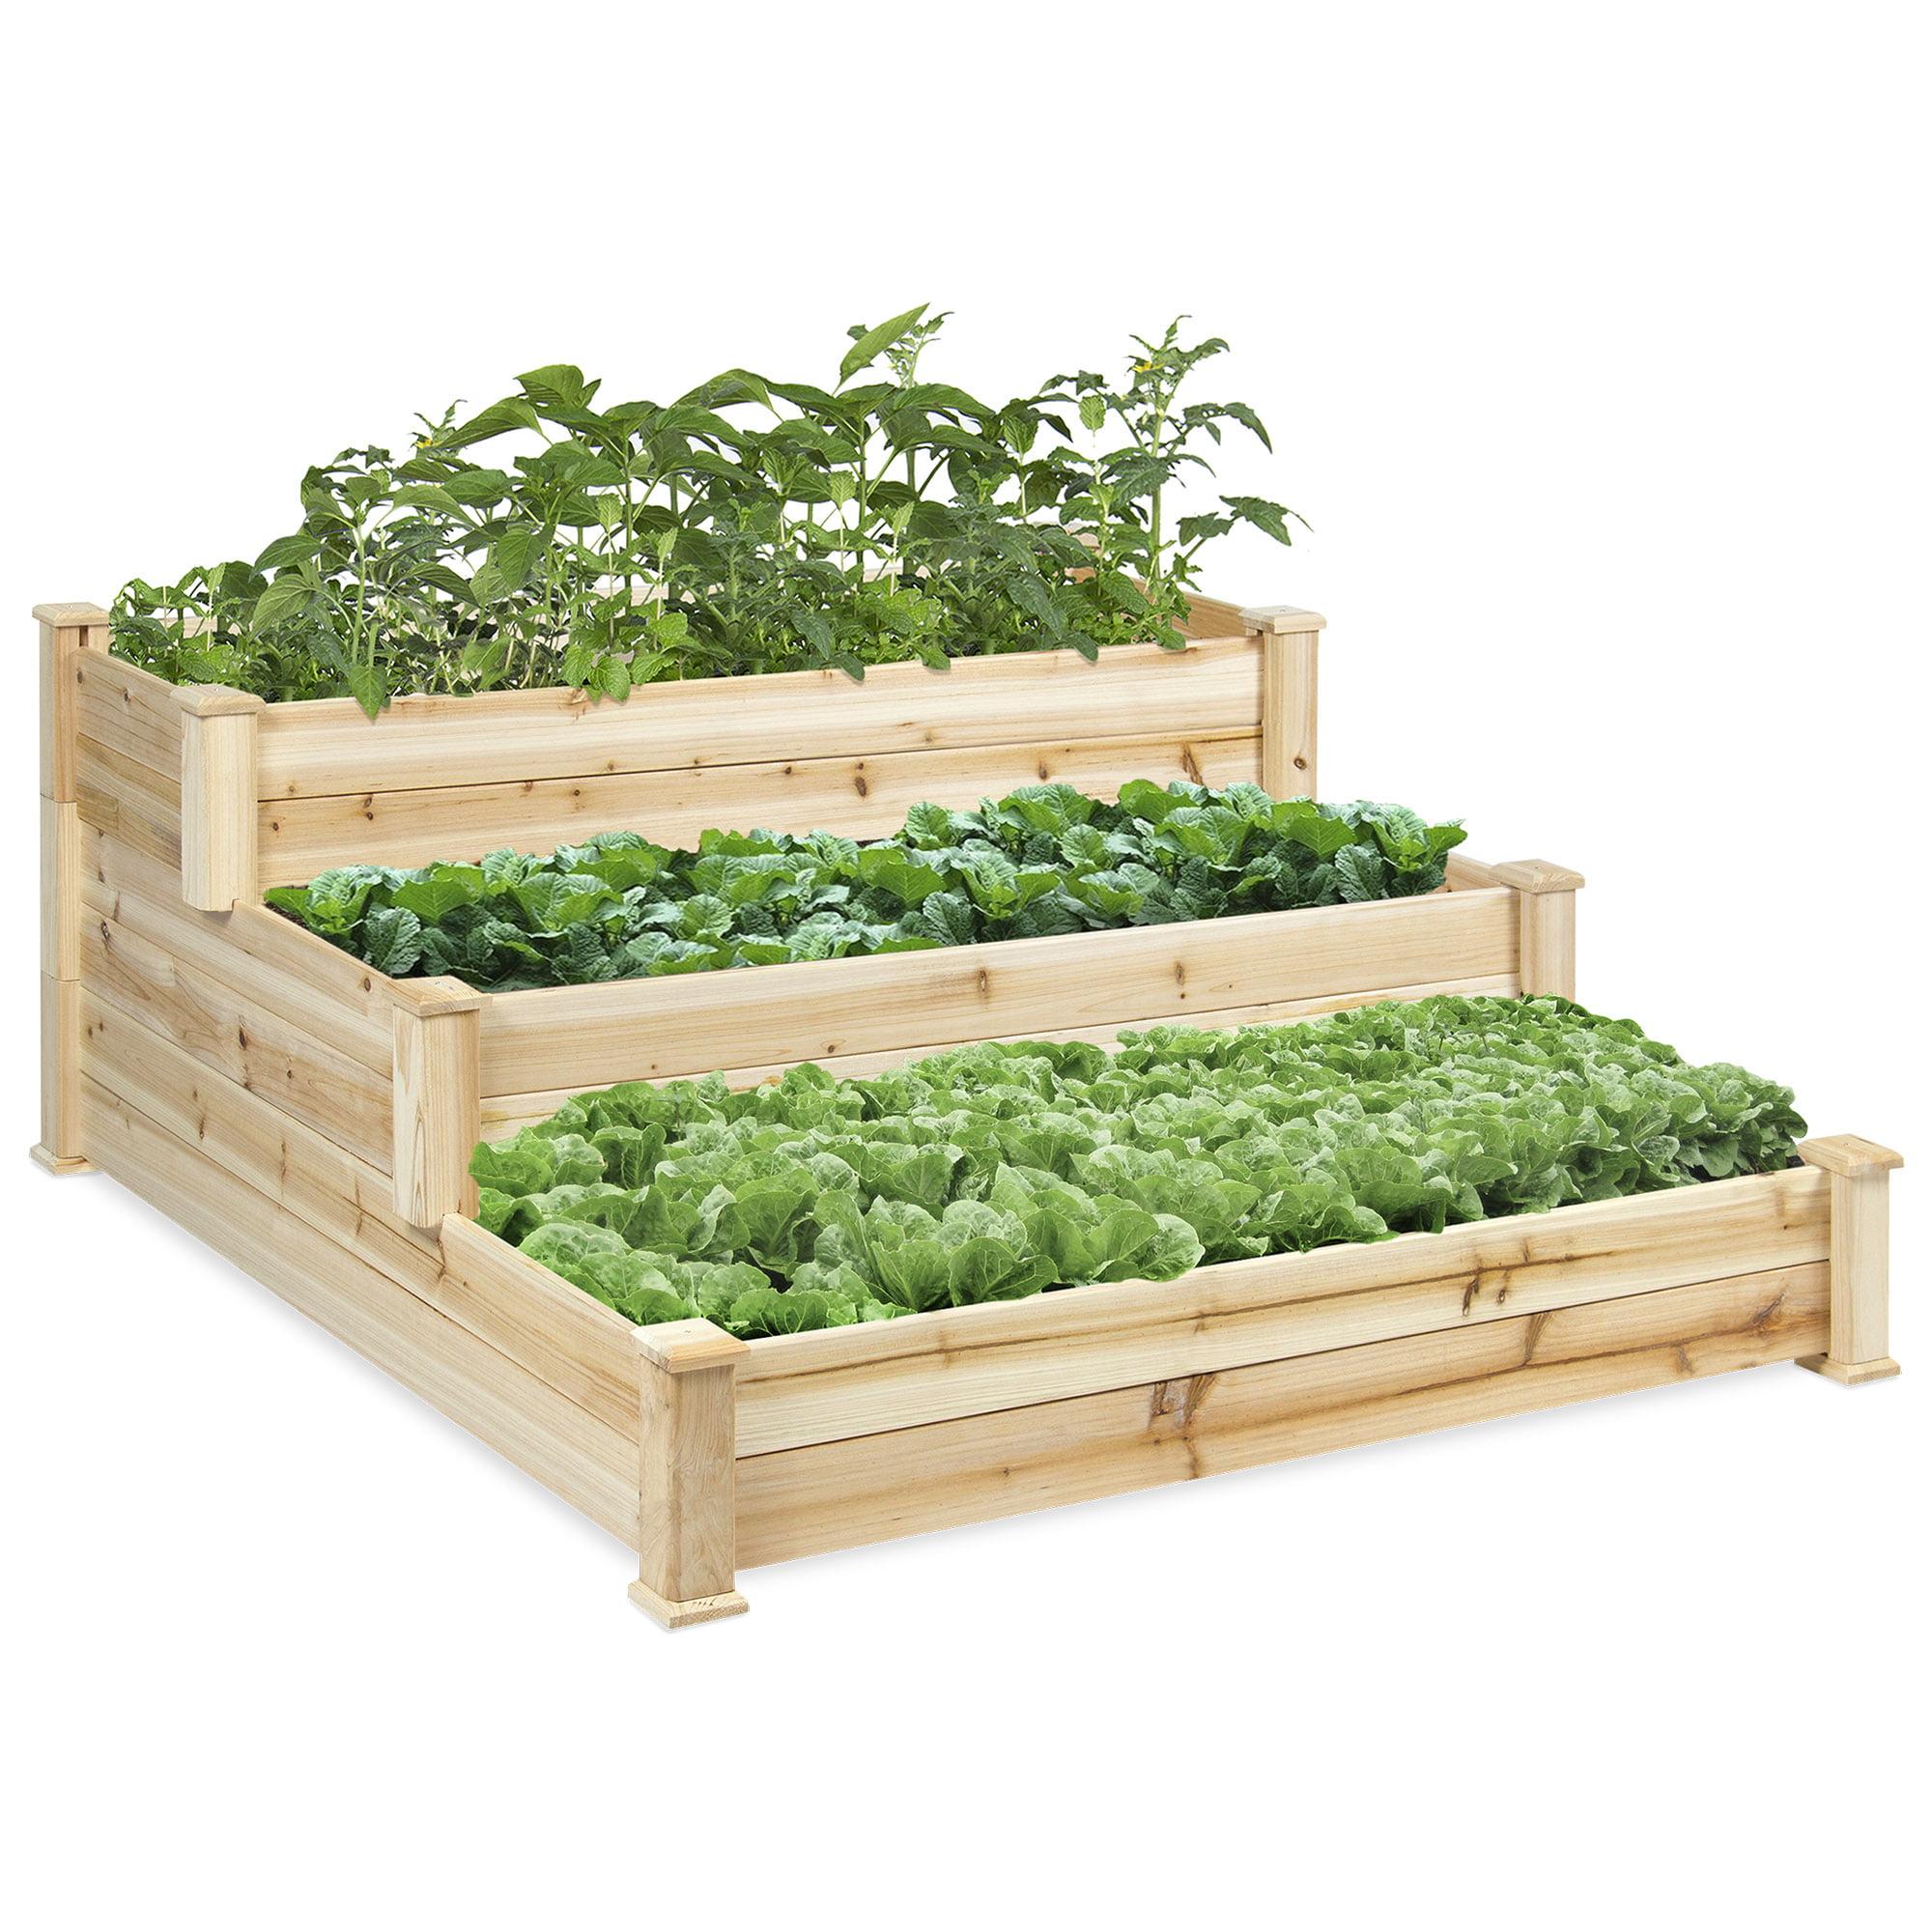 Best Choice Products 3 Tier Wooden Raised Vegetable Garden Bed Planter Kit For Outdoor Gardening Natural Walmart Com Walmart Com